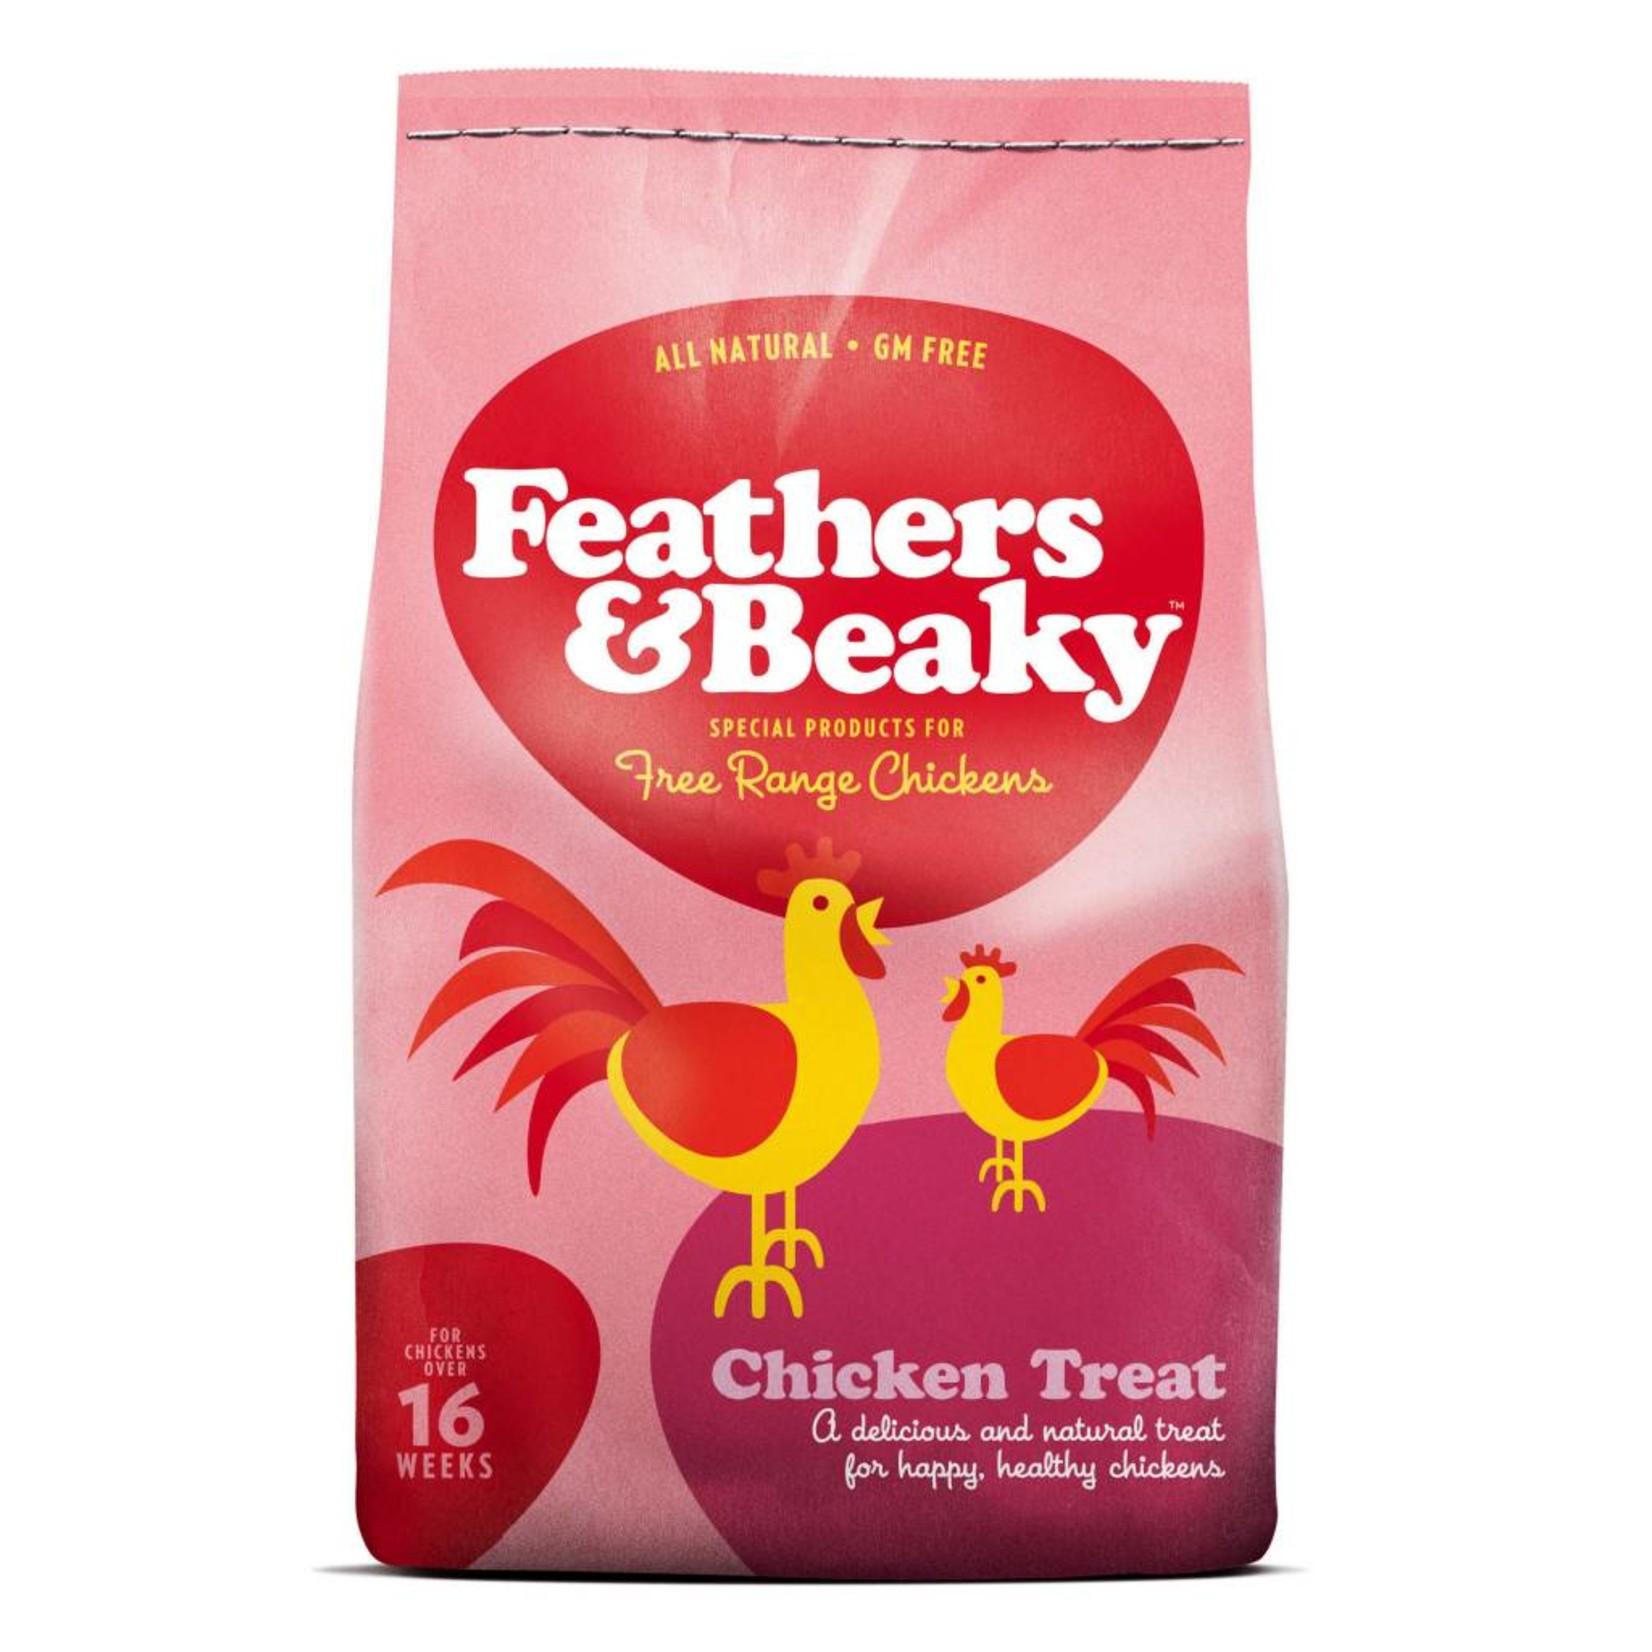 Feathers & Beaky Free Range Chicken Treat, 5kg